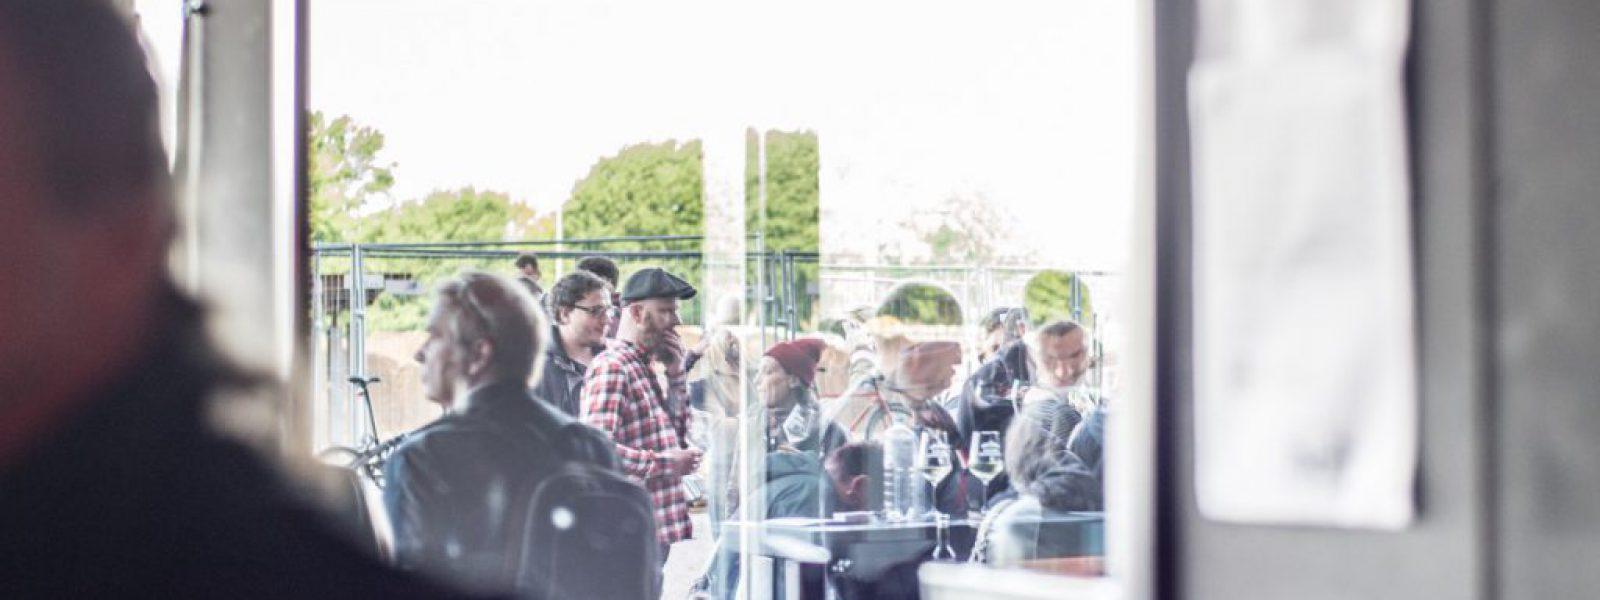 Weinfest gegen Rassismus (Fotos Sabrina Adeline Nagel) - 35